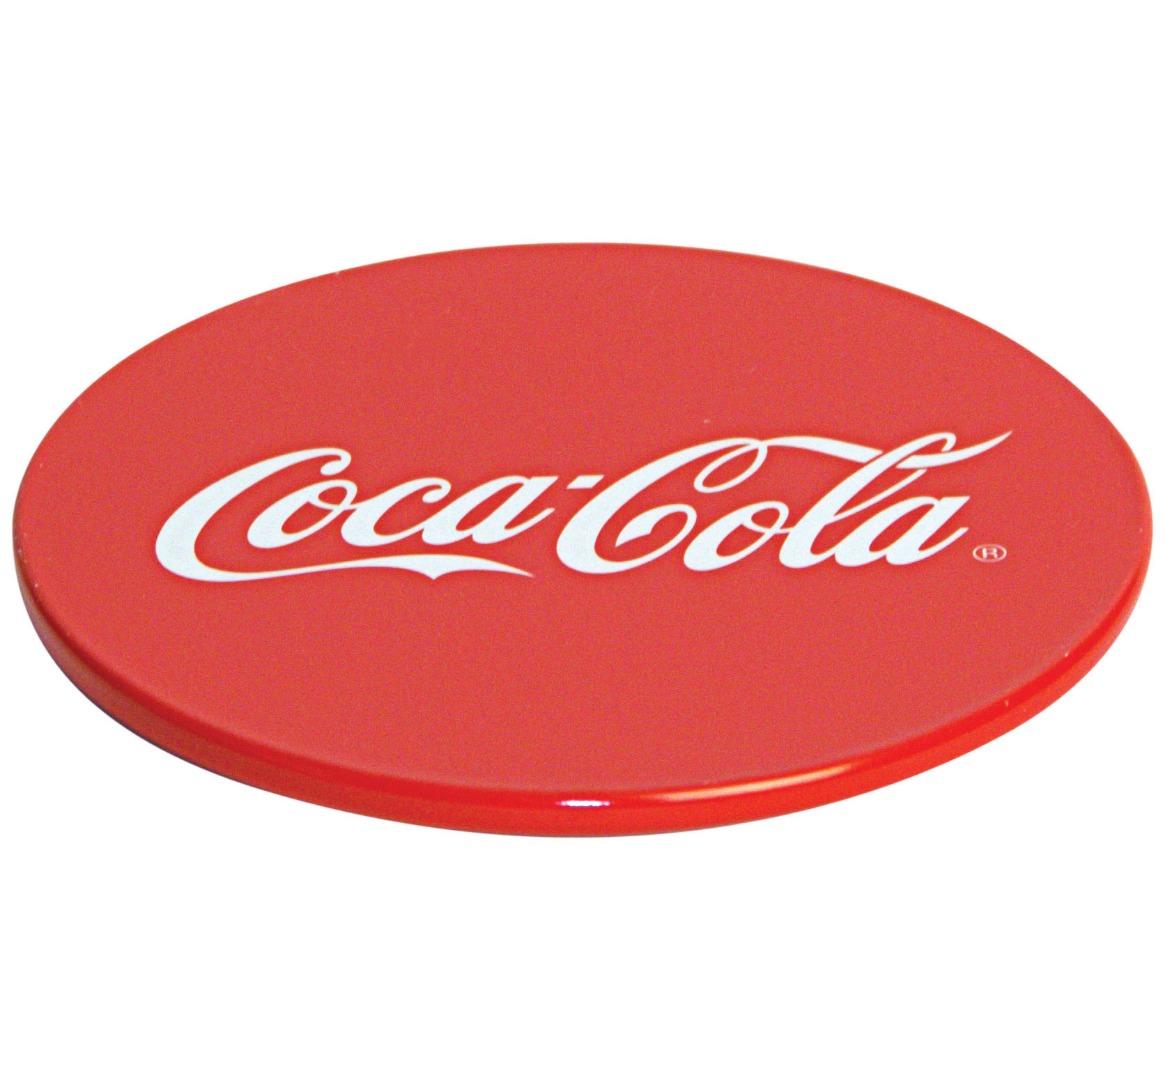 Coca Cola - Dia.89 - Metal Coasters - Round -